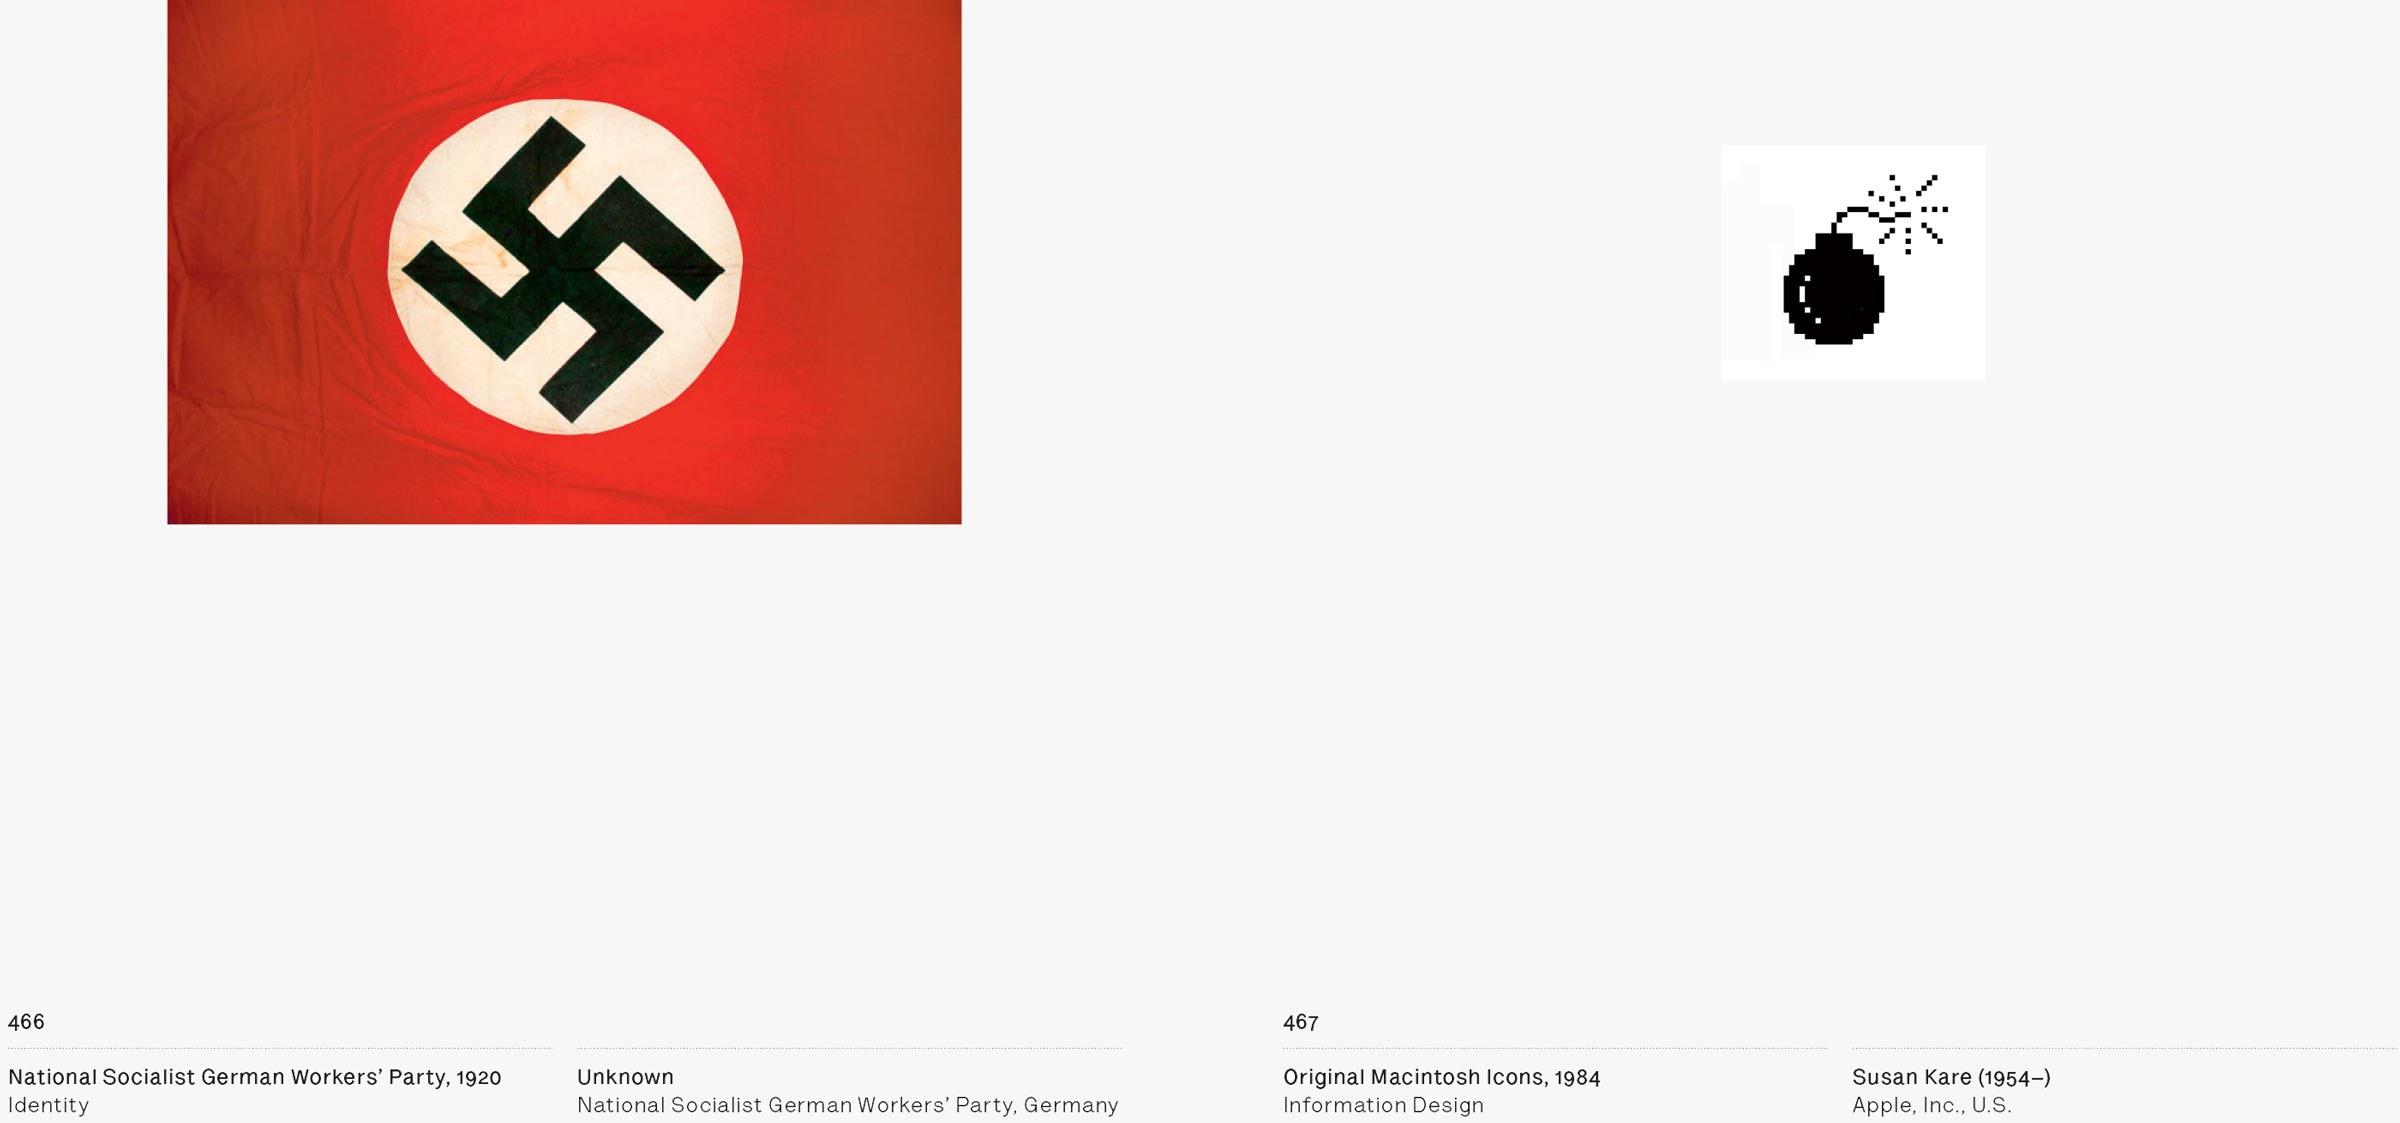 466-7-Nazi-sign-bomb